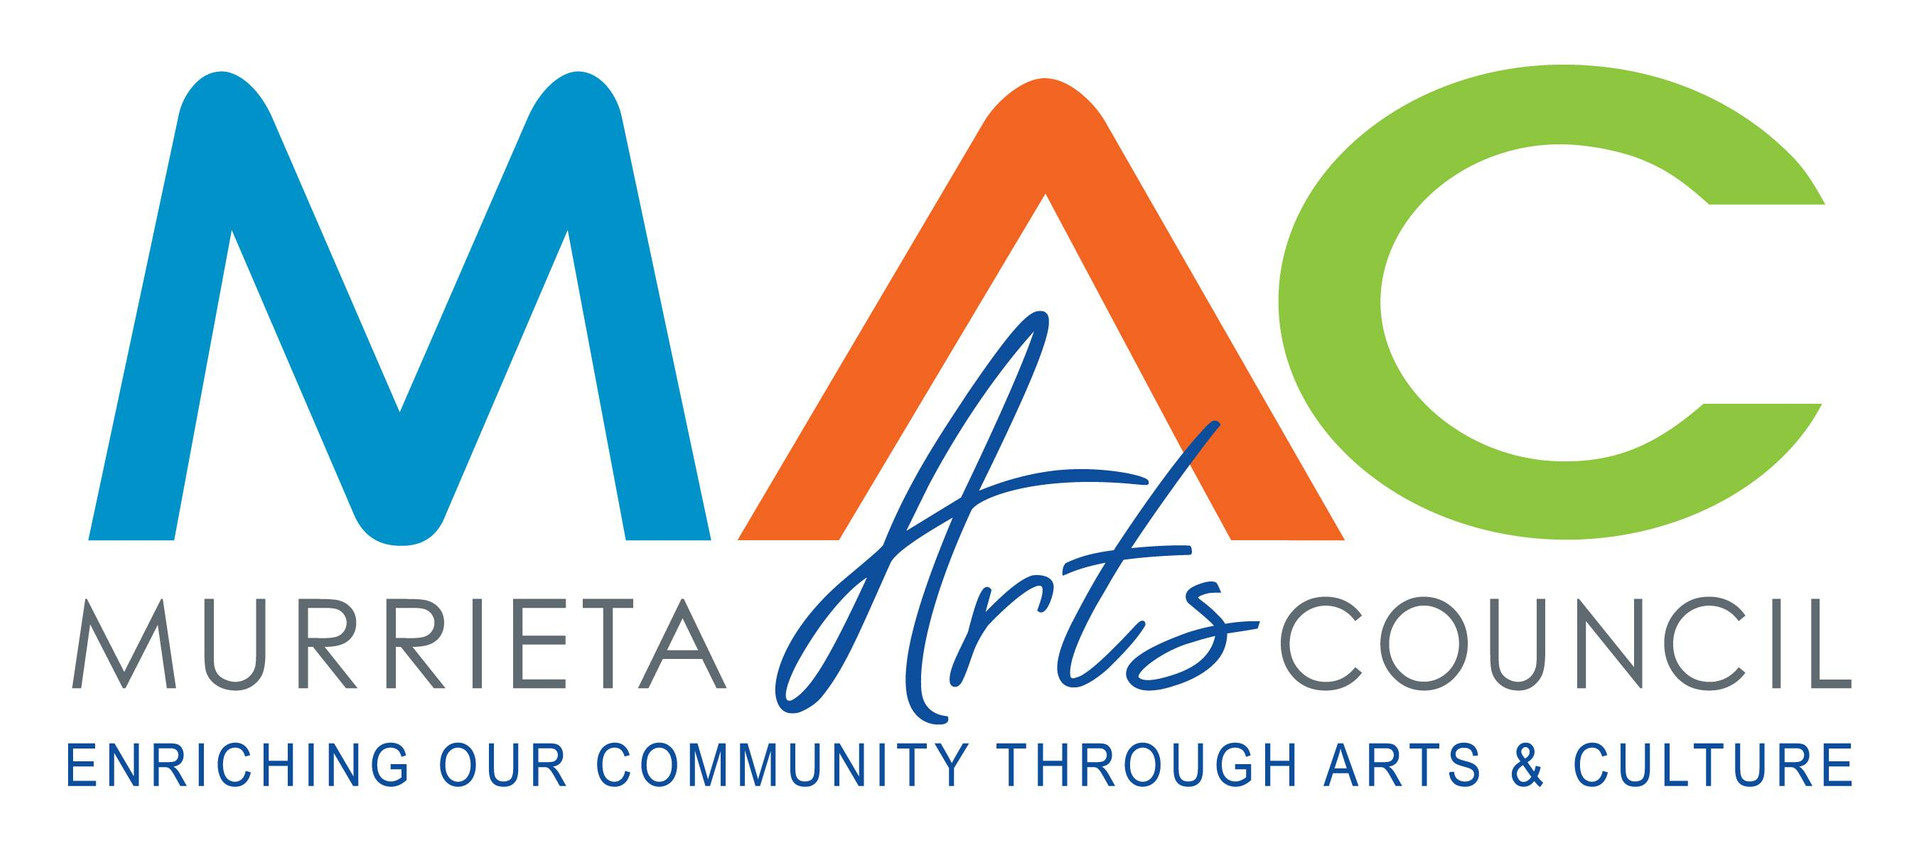 Murrieta Arts Council